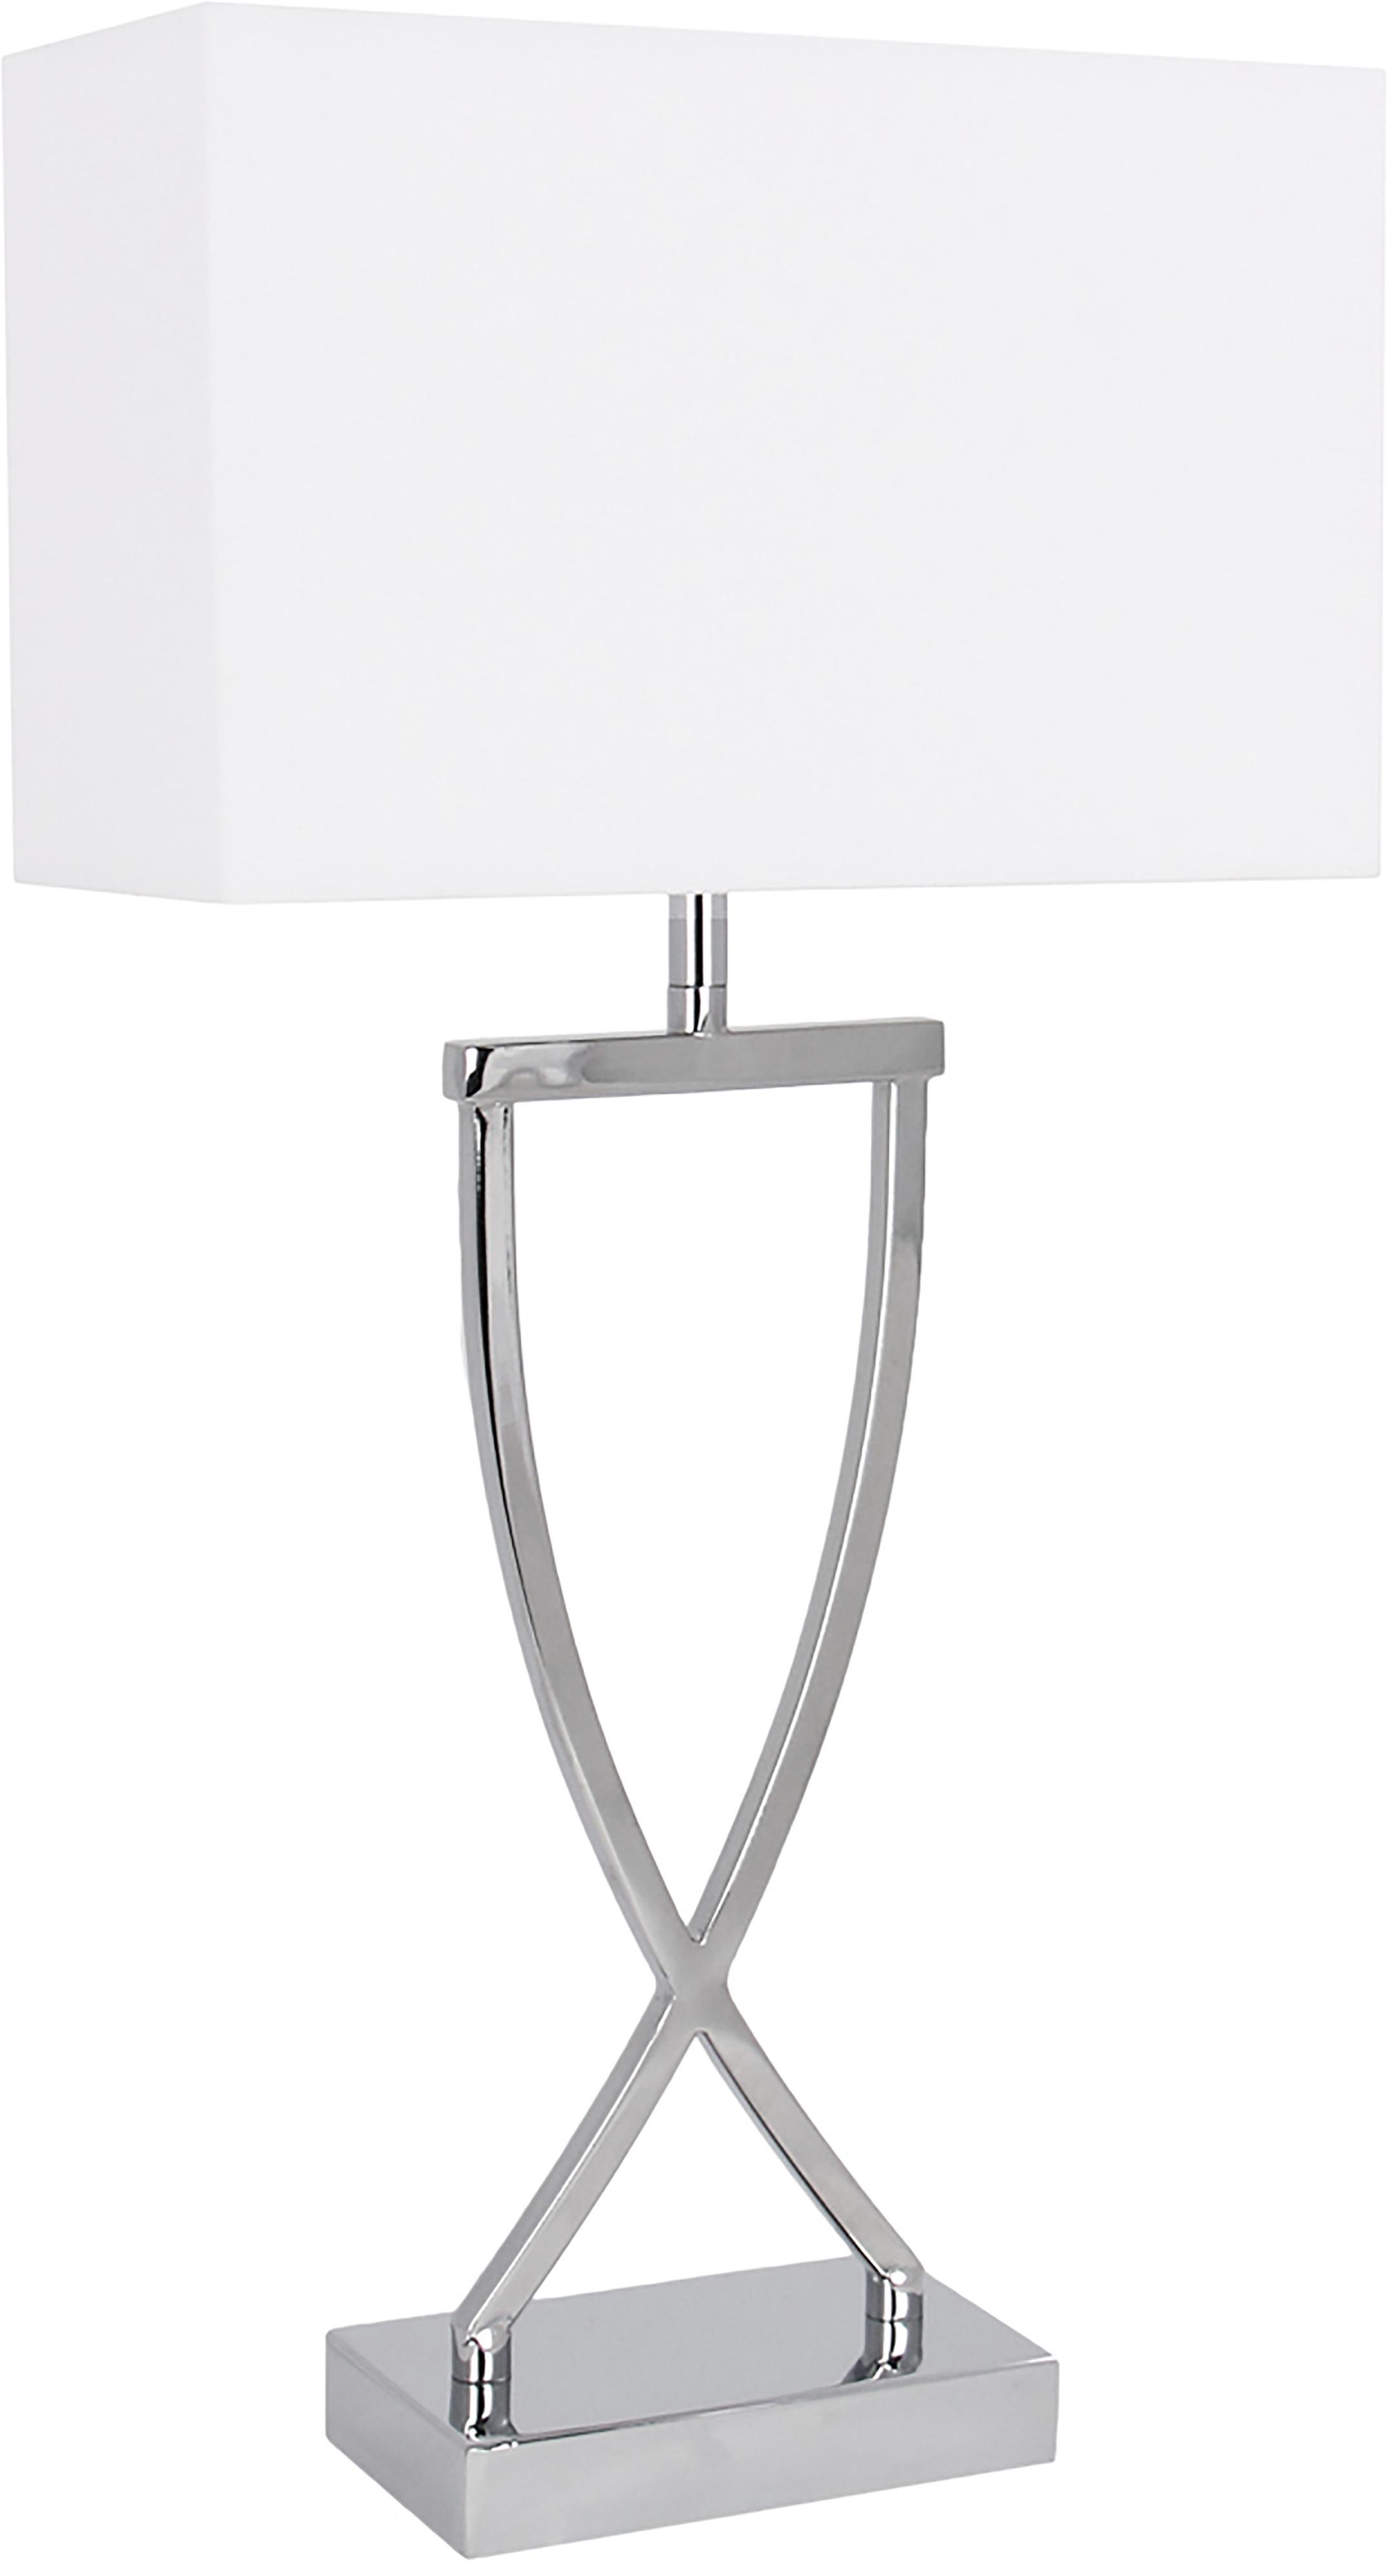 Klassische Tischlampe Vanessa, Lampenschirm: Textil, Lampenfuss: Chrom, Lampenschirm: Weiss, Kabel: Weiss, 27 x 52 cm